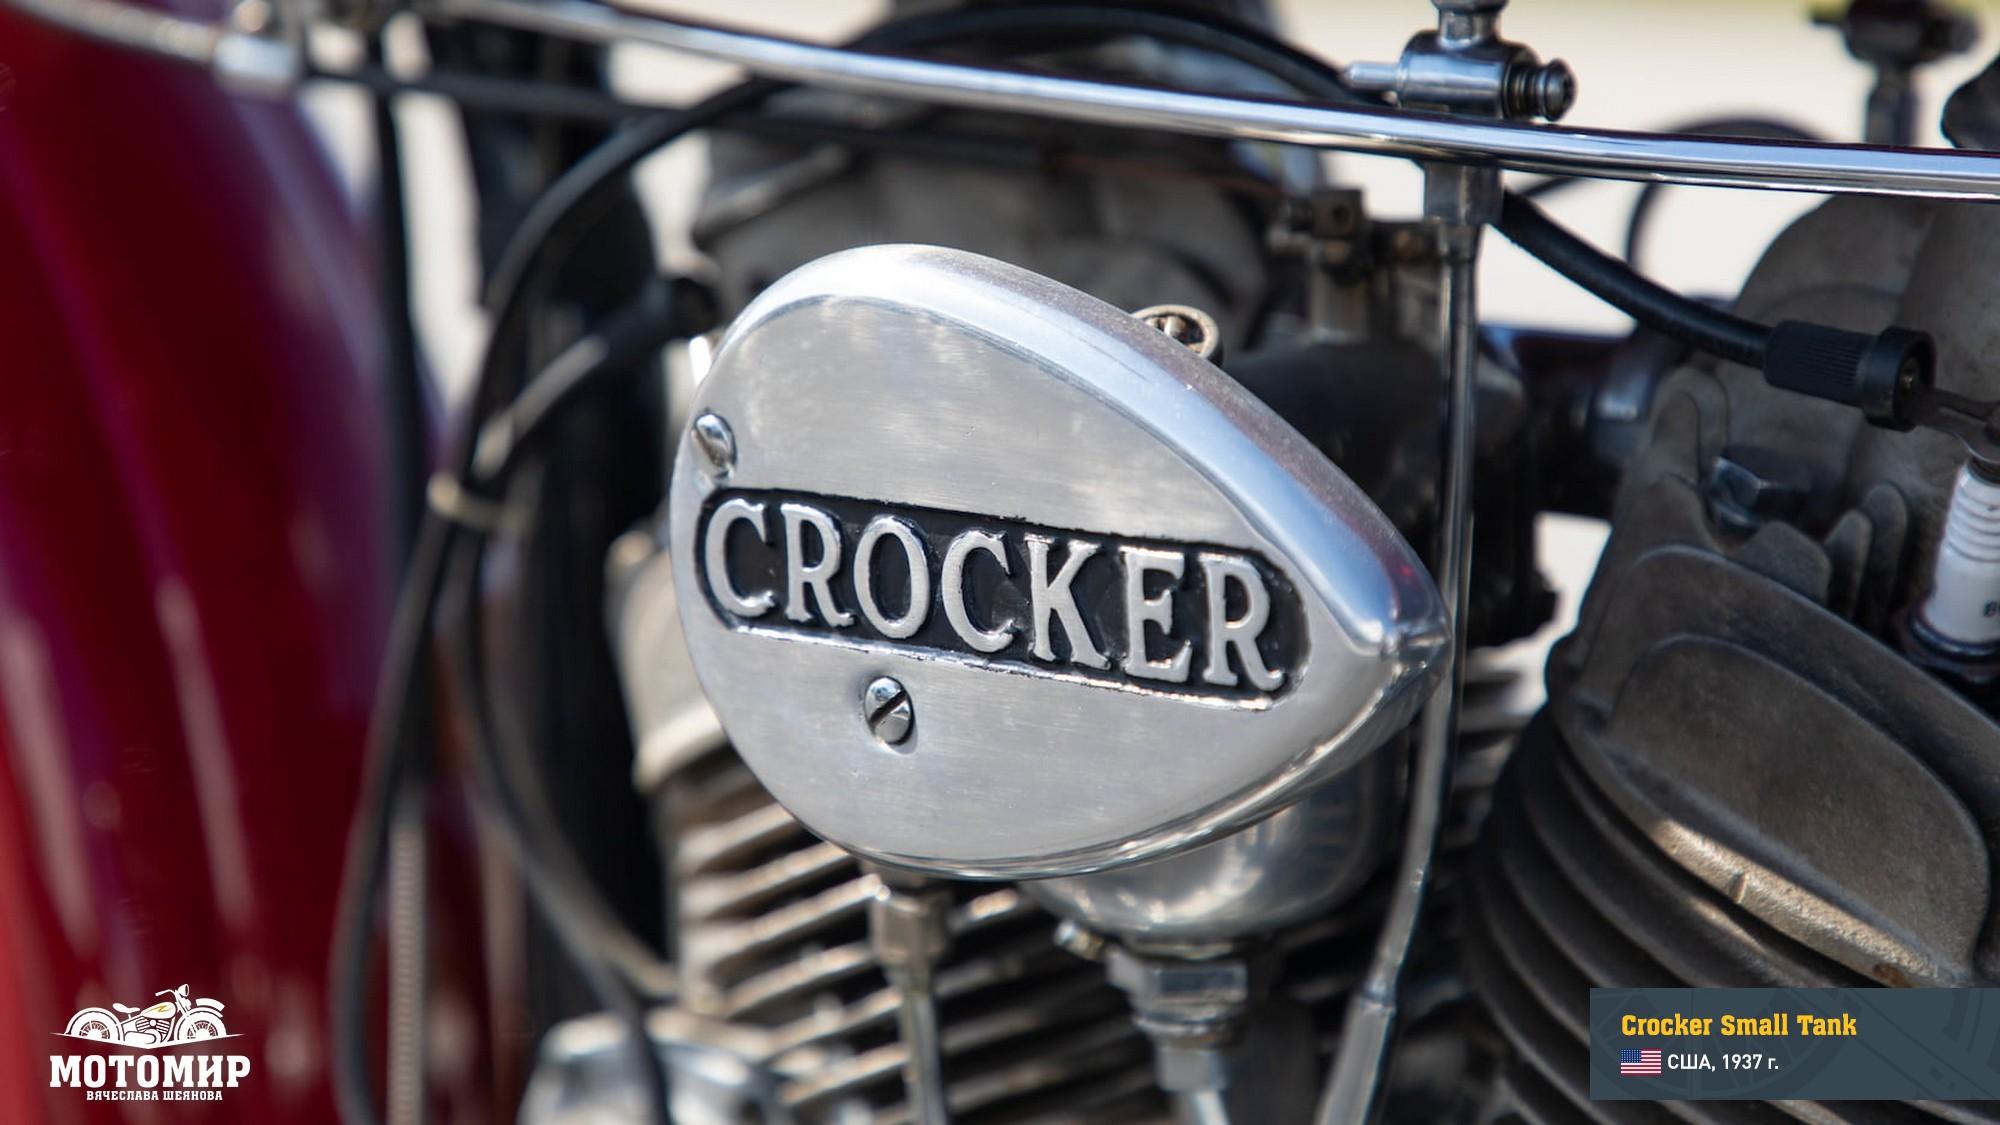 Original Crocker Small Tank